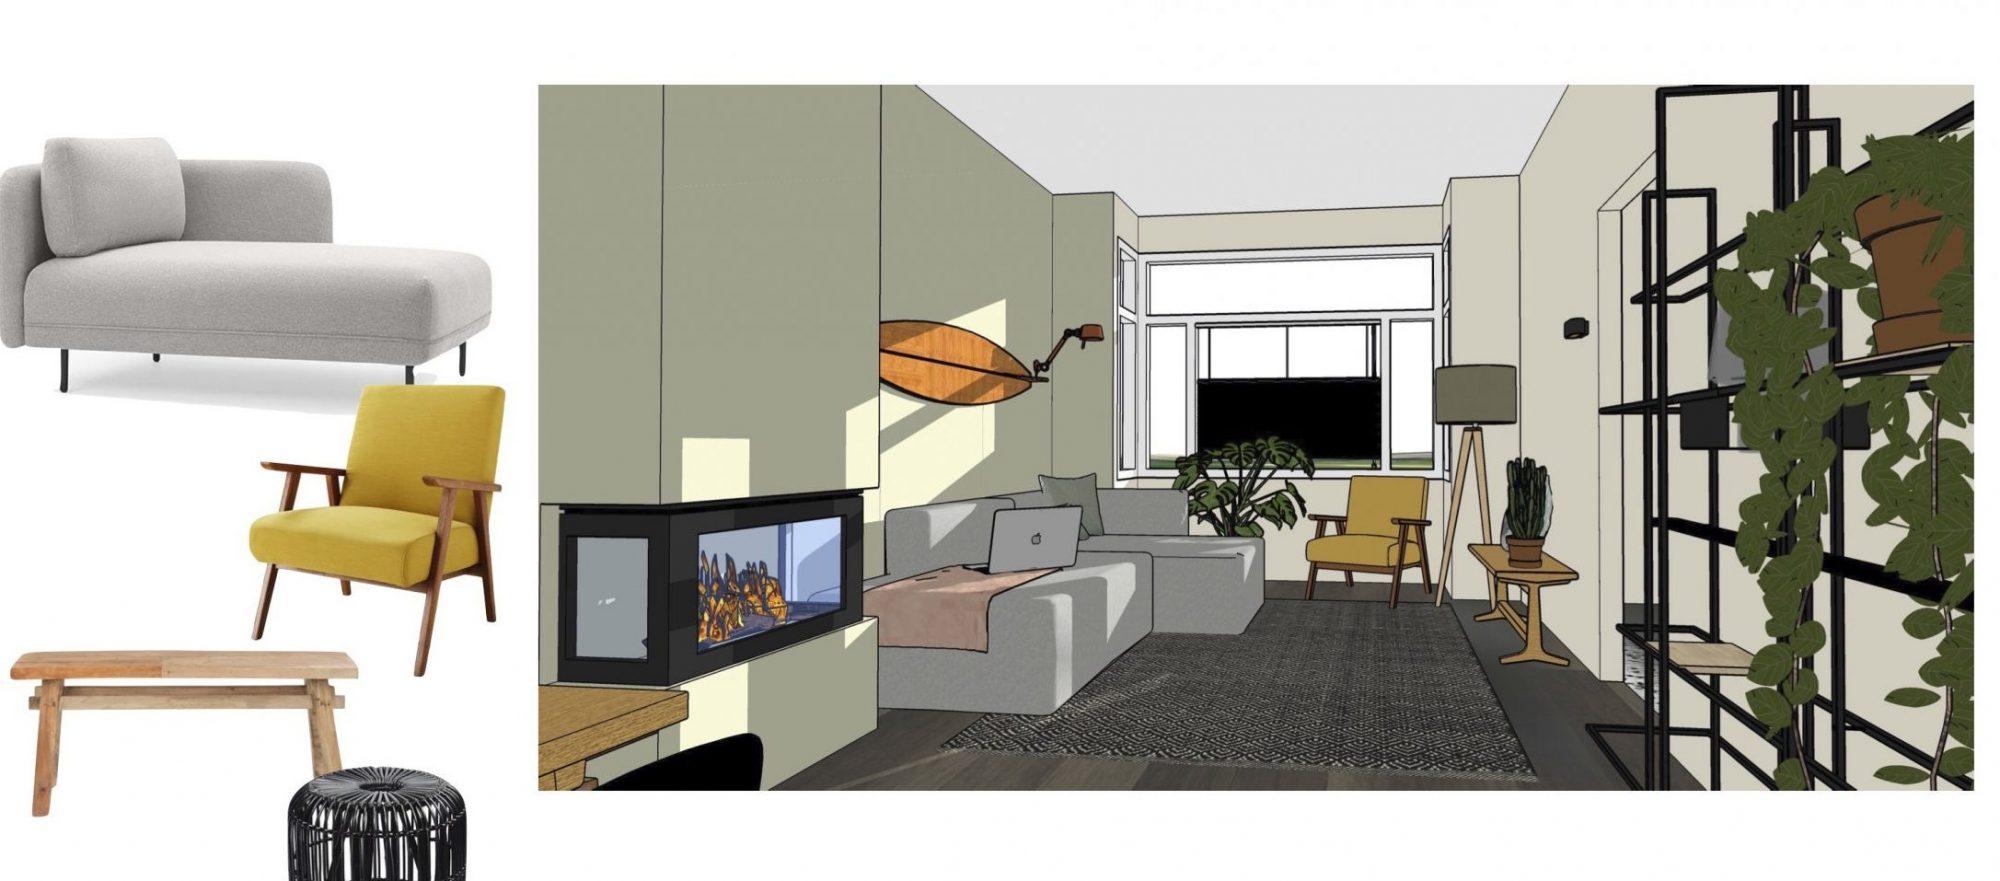 interieuradvies interieurplan DIY stoer warm nest zithoek